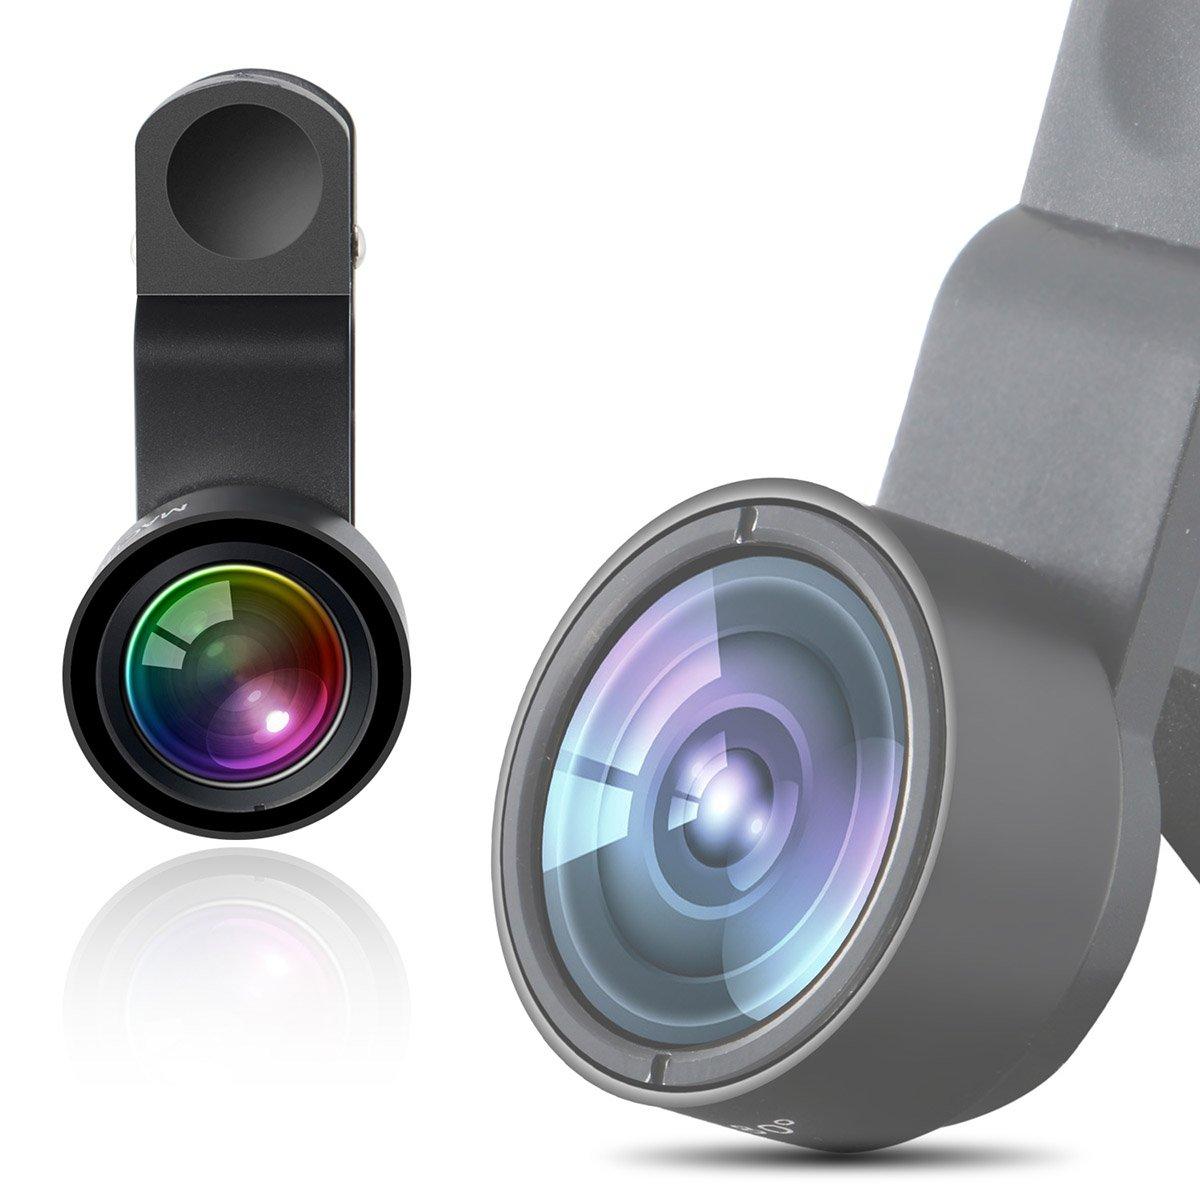 Cell Phone Lens Mactrem 180 Degree FishEye Universal Camera Phone Lens